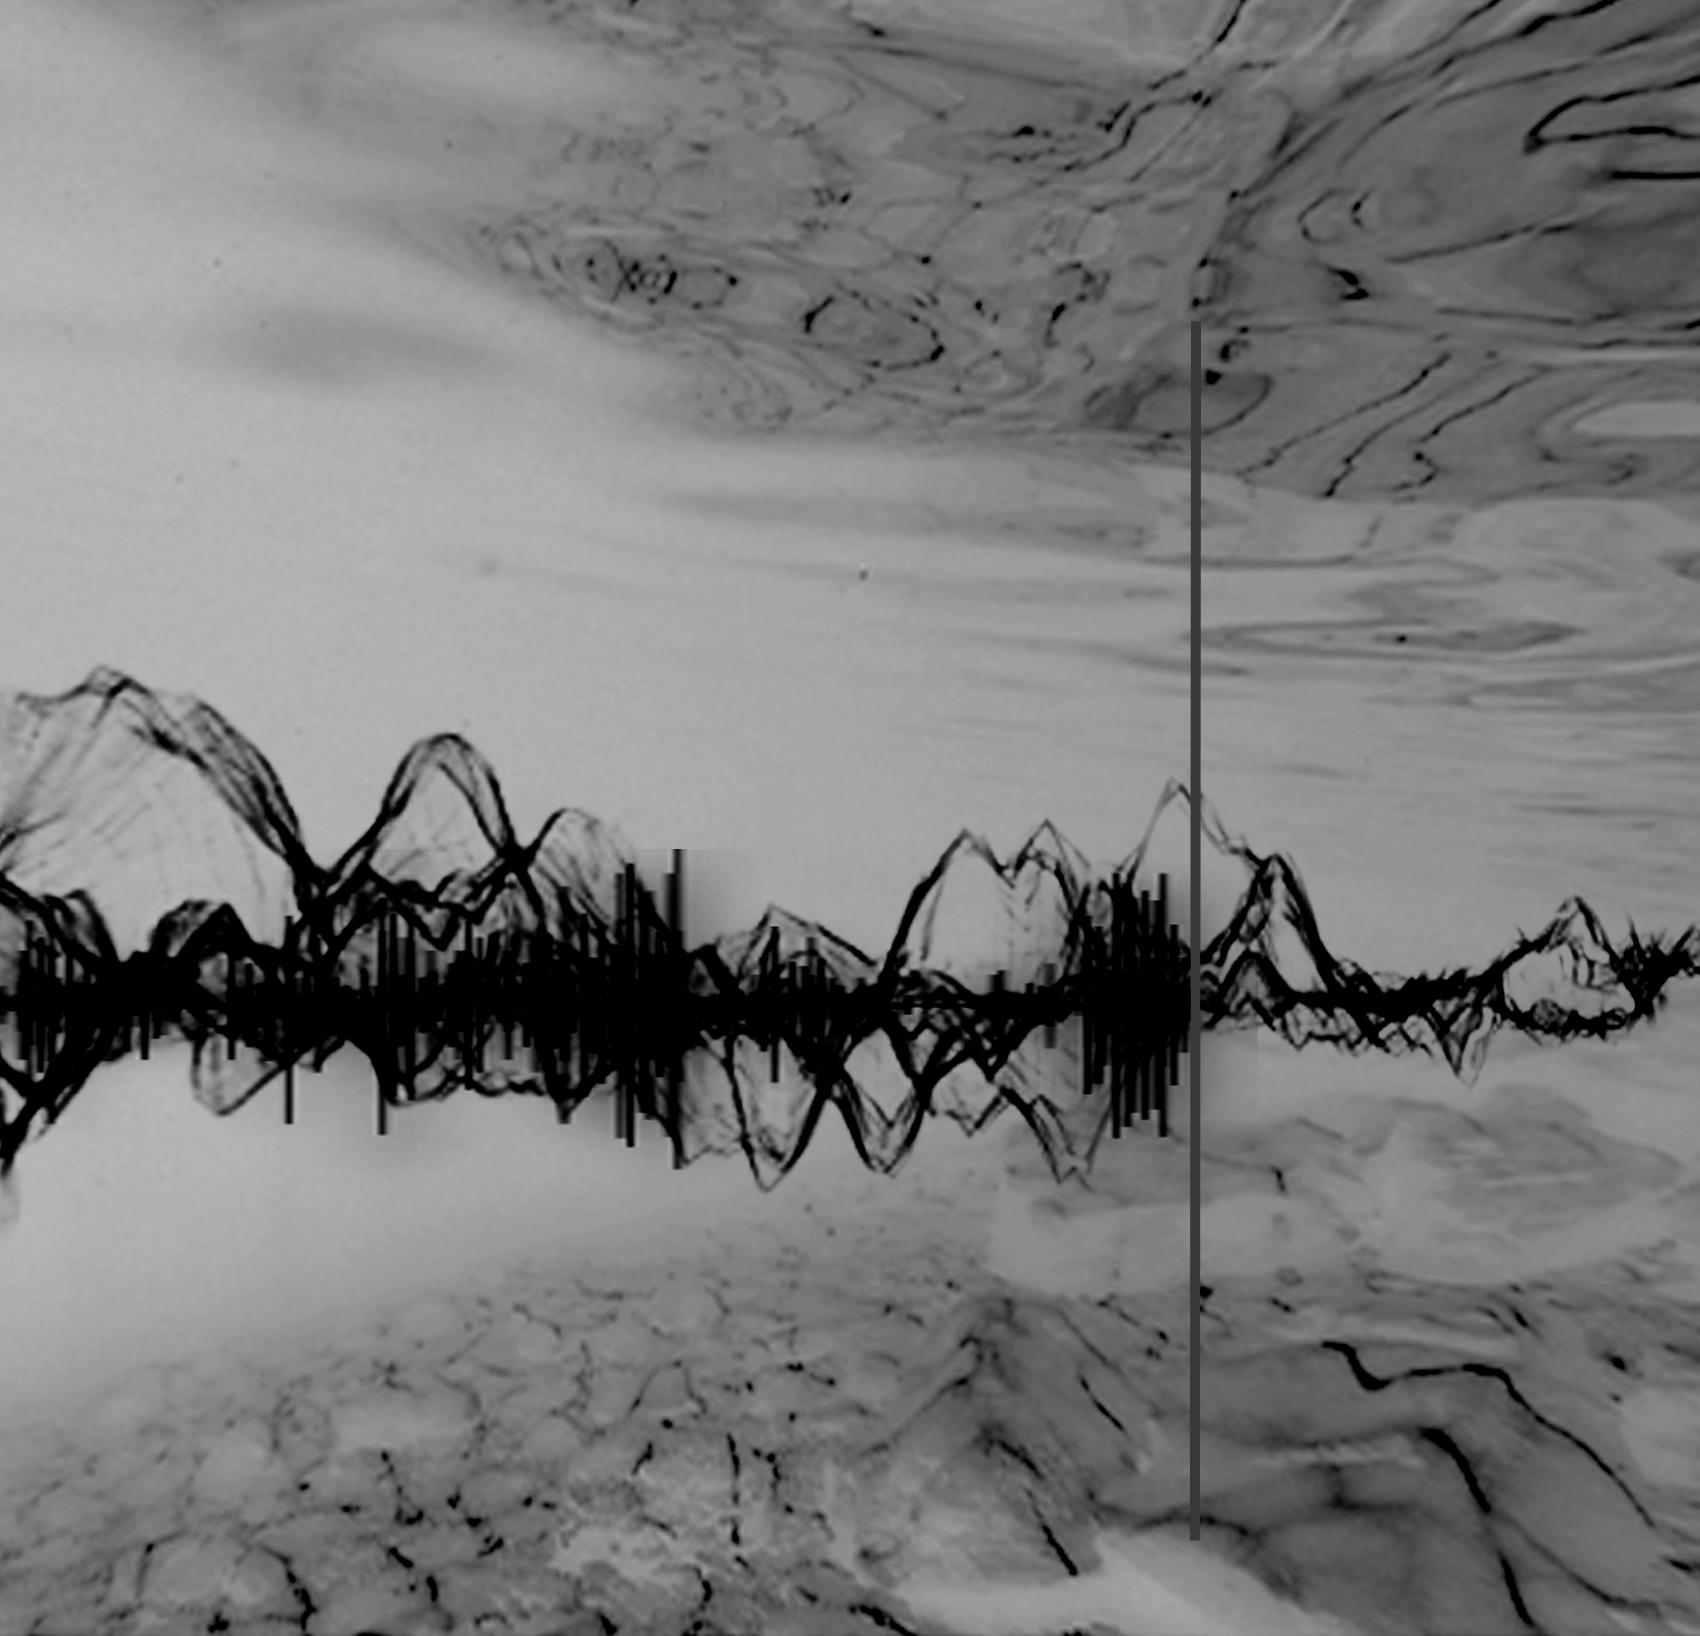 aquatocene-subaquatic-quest-for-serenity-new-01